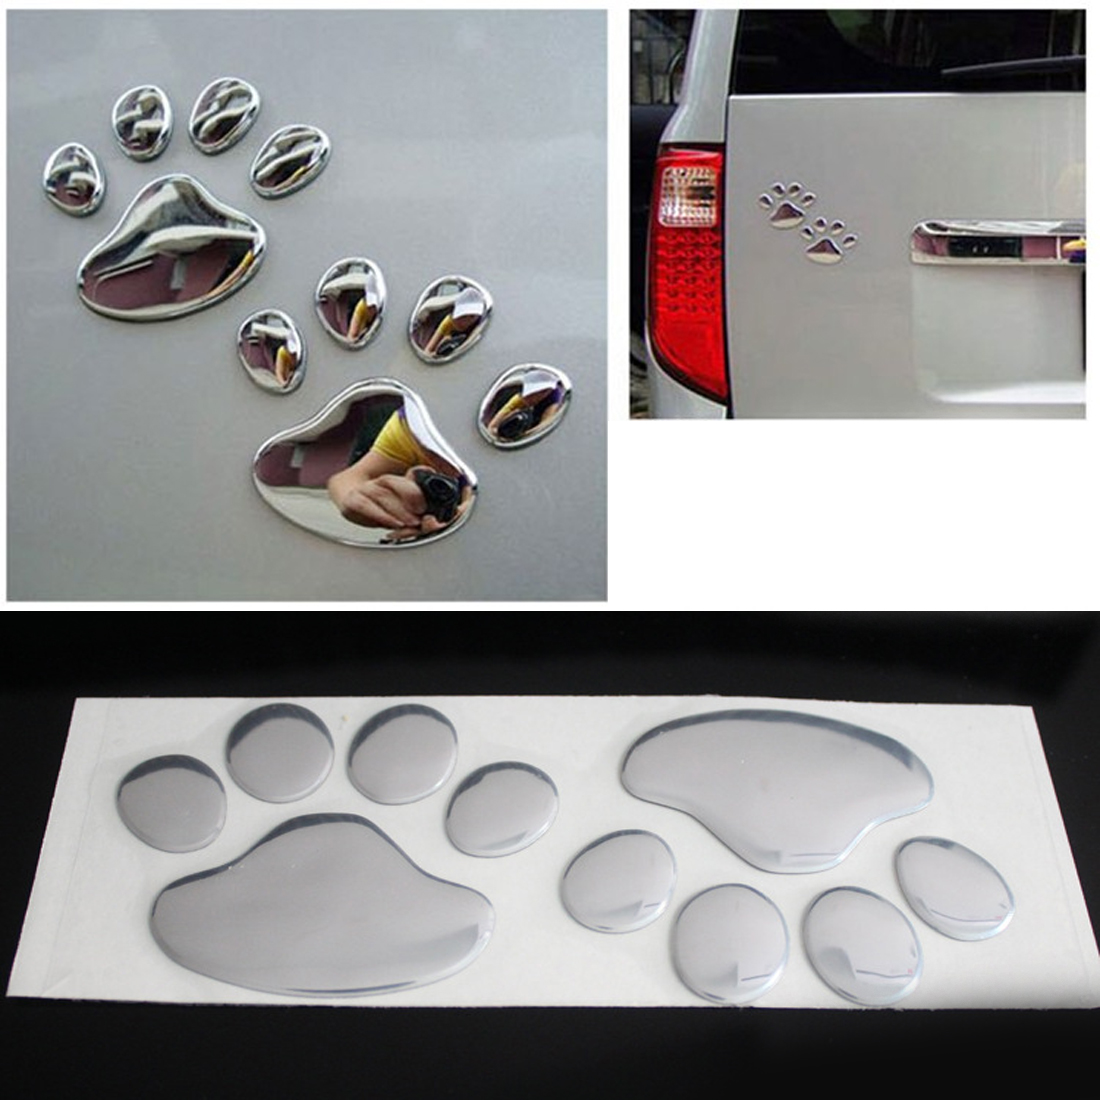 Pair Cool Design Paw Car Sticker 3D Animal Dog Cat Bear Foot Prints Footprint 3M Decal Car Stickers Silver Gold